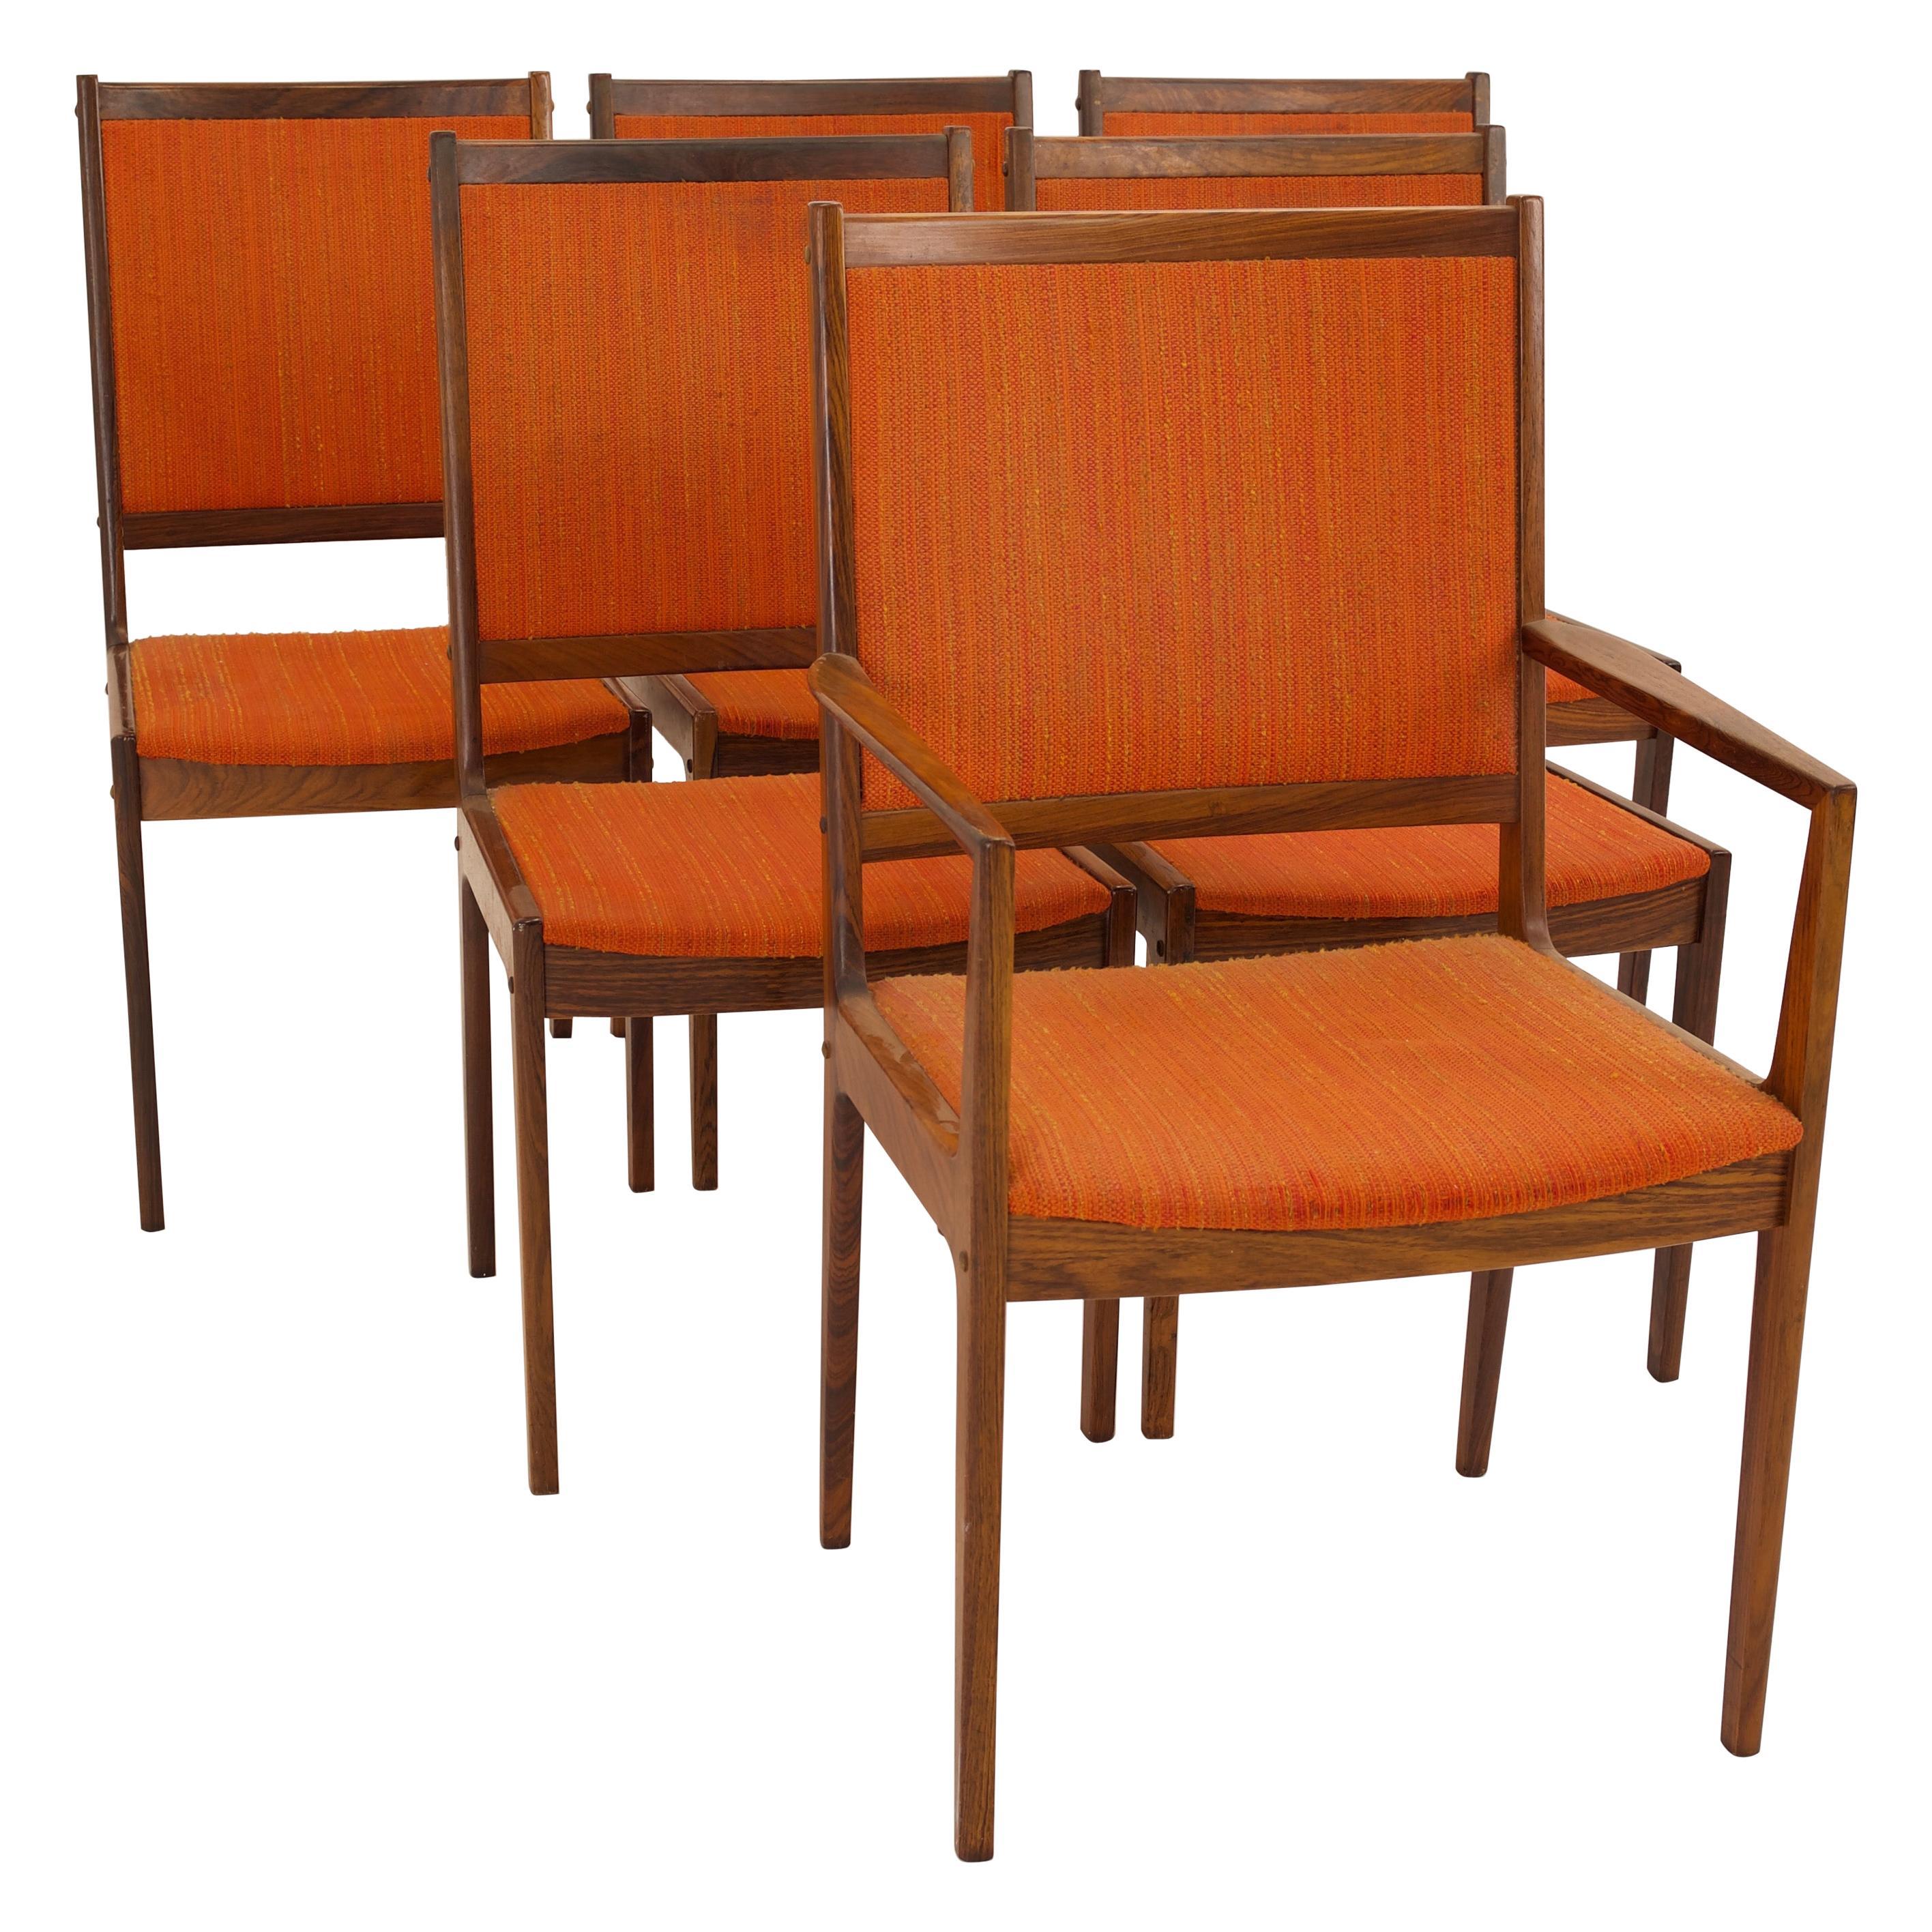 Kofod Larsen Mid Century Rosewood Highback Dining Chairs, Set of 6